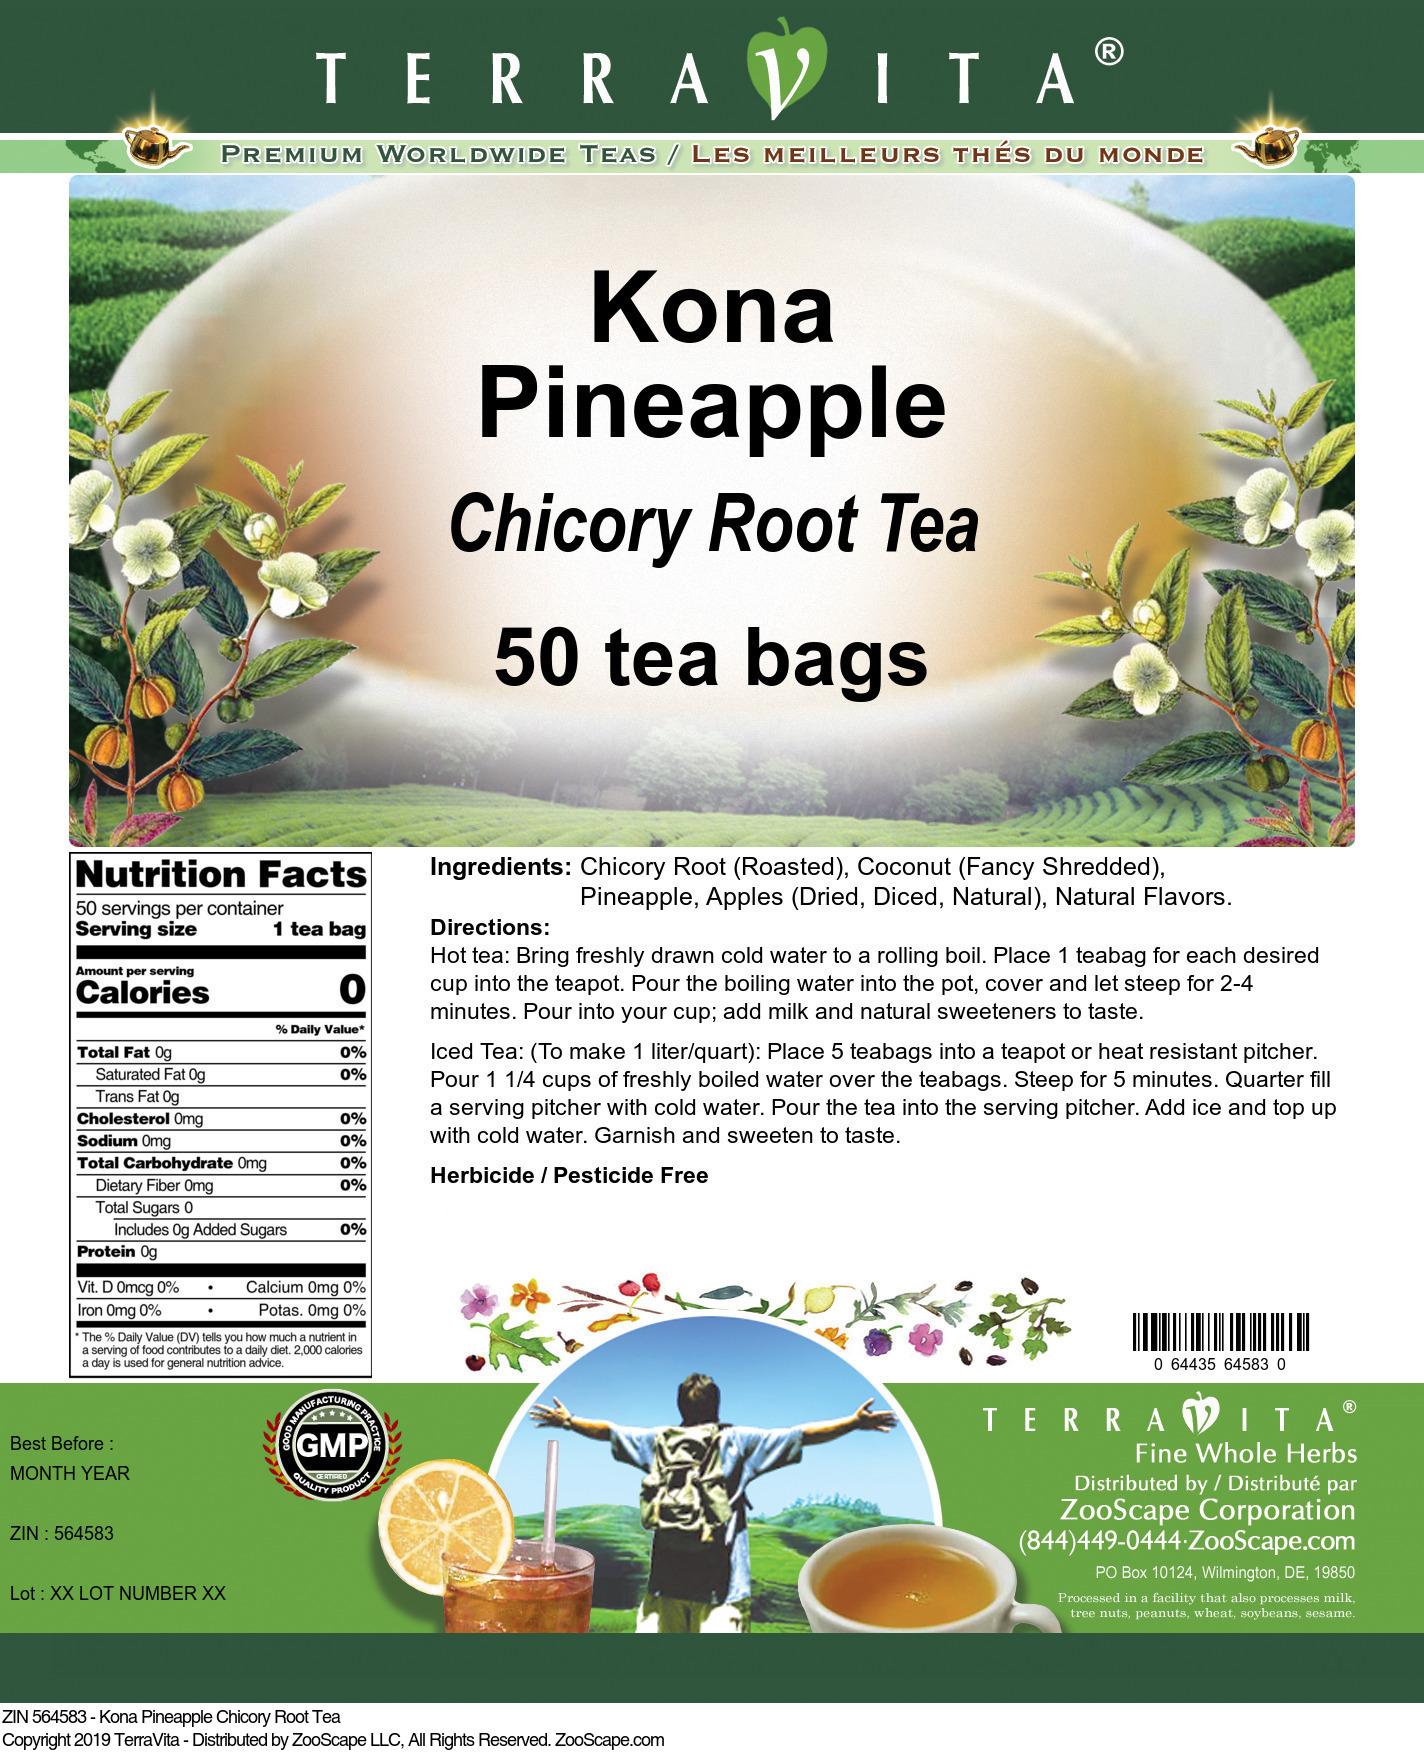 Kona Pineapple Chicory Root